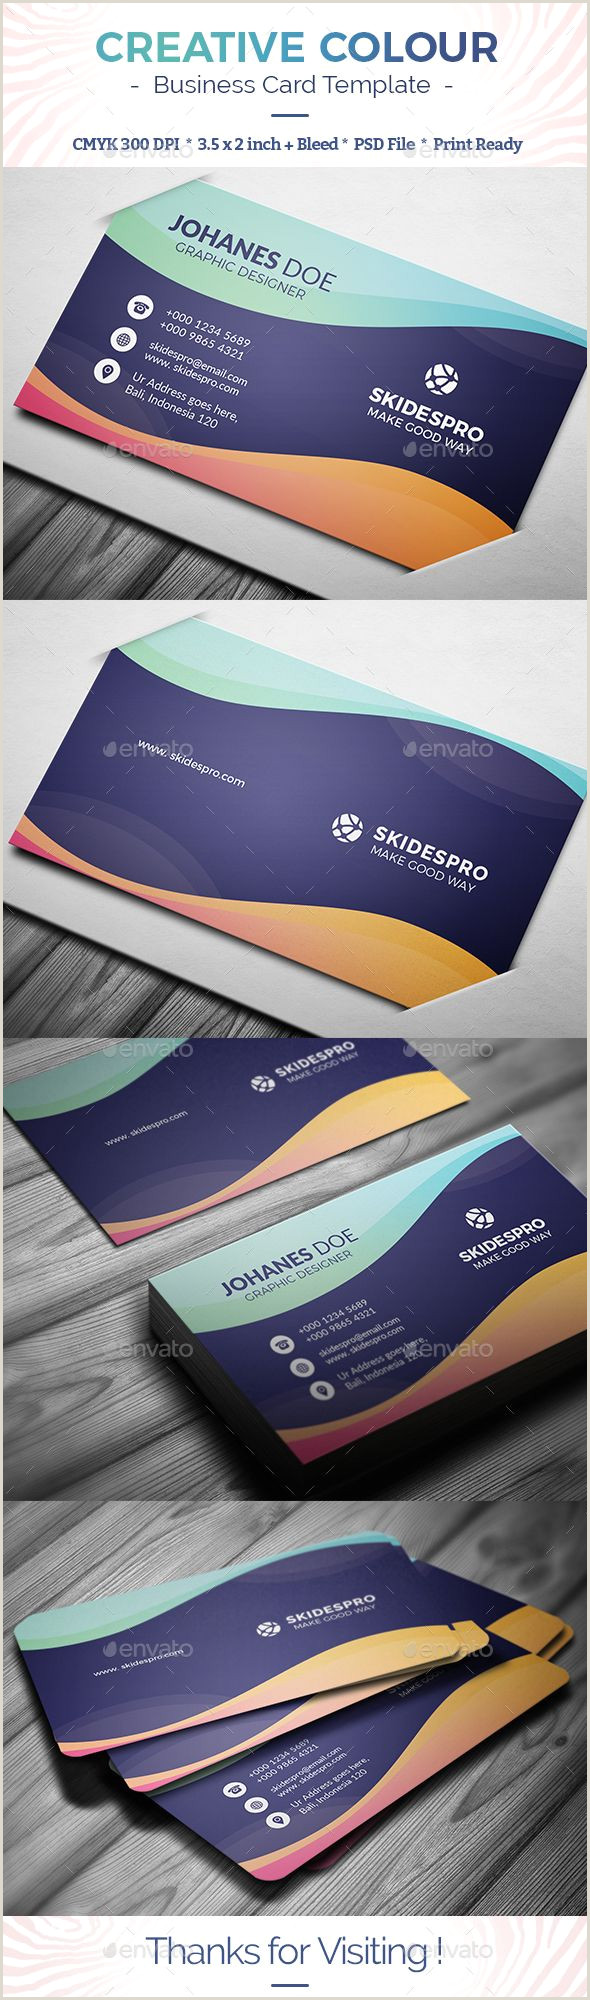 Business Card With 2 Logos Creative Colour